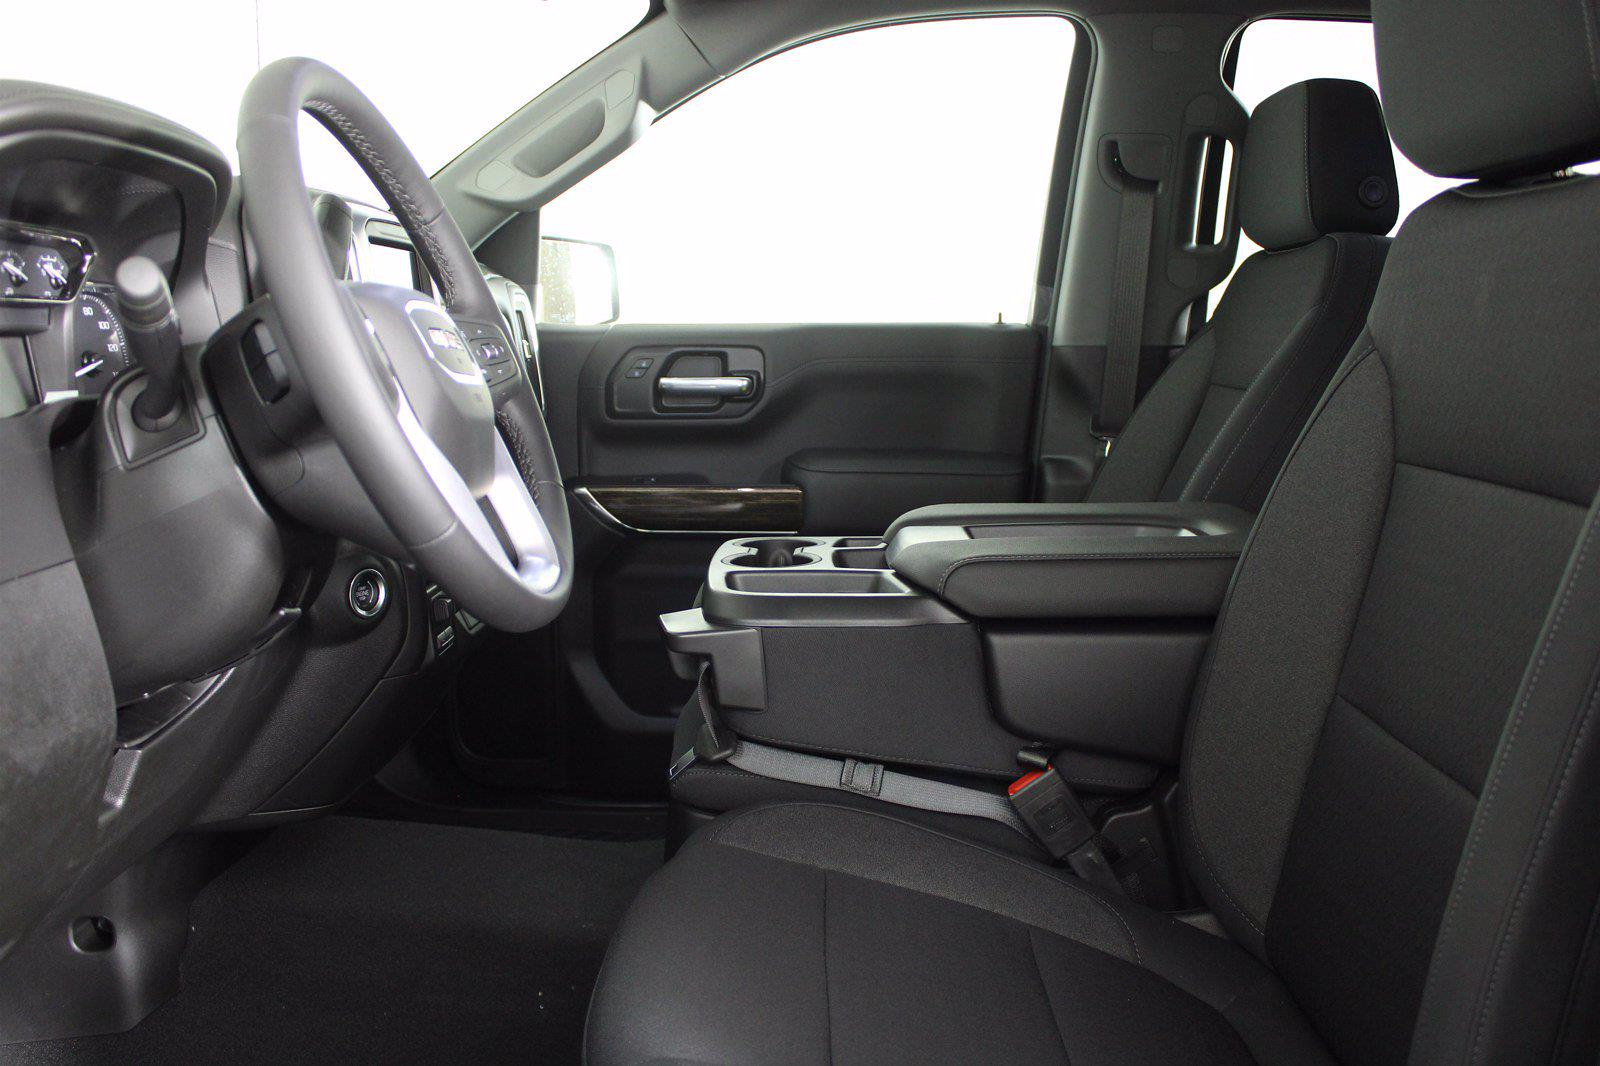 2021 GMC Sierra 1500 Crew Cab 4x4, Pickup #D411035 - photo 15